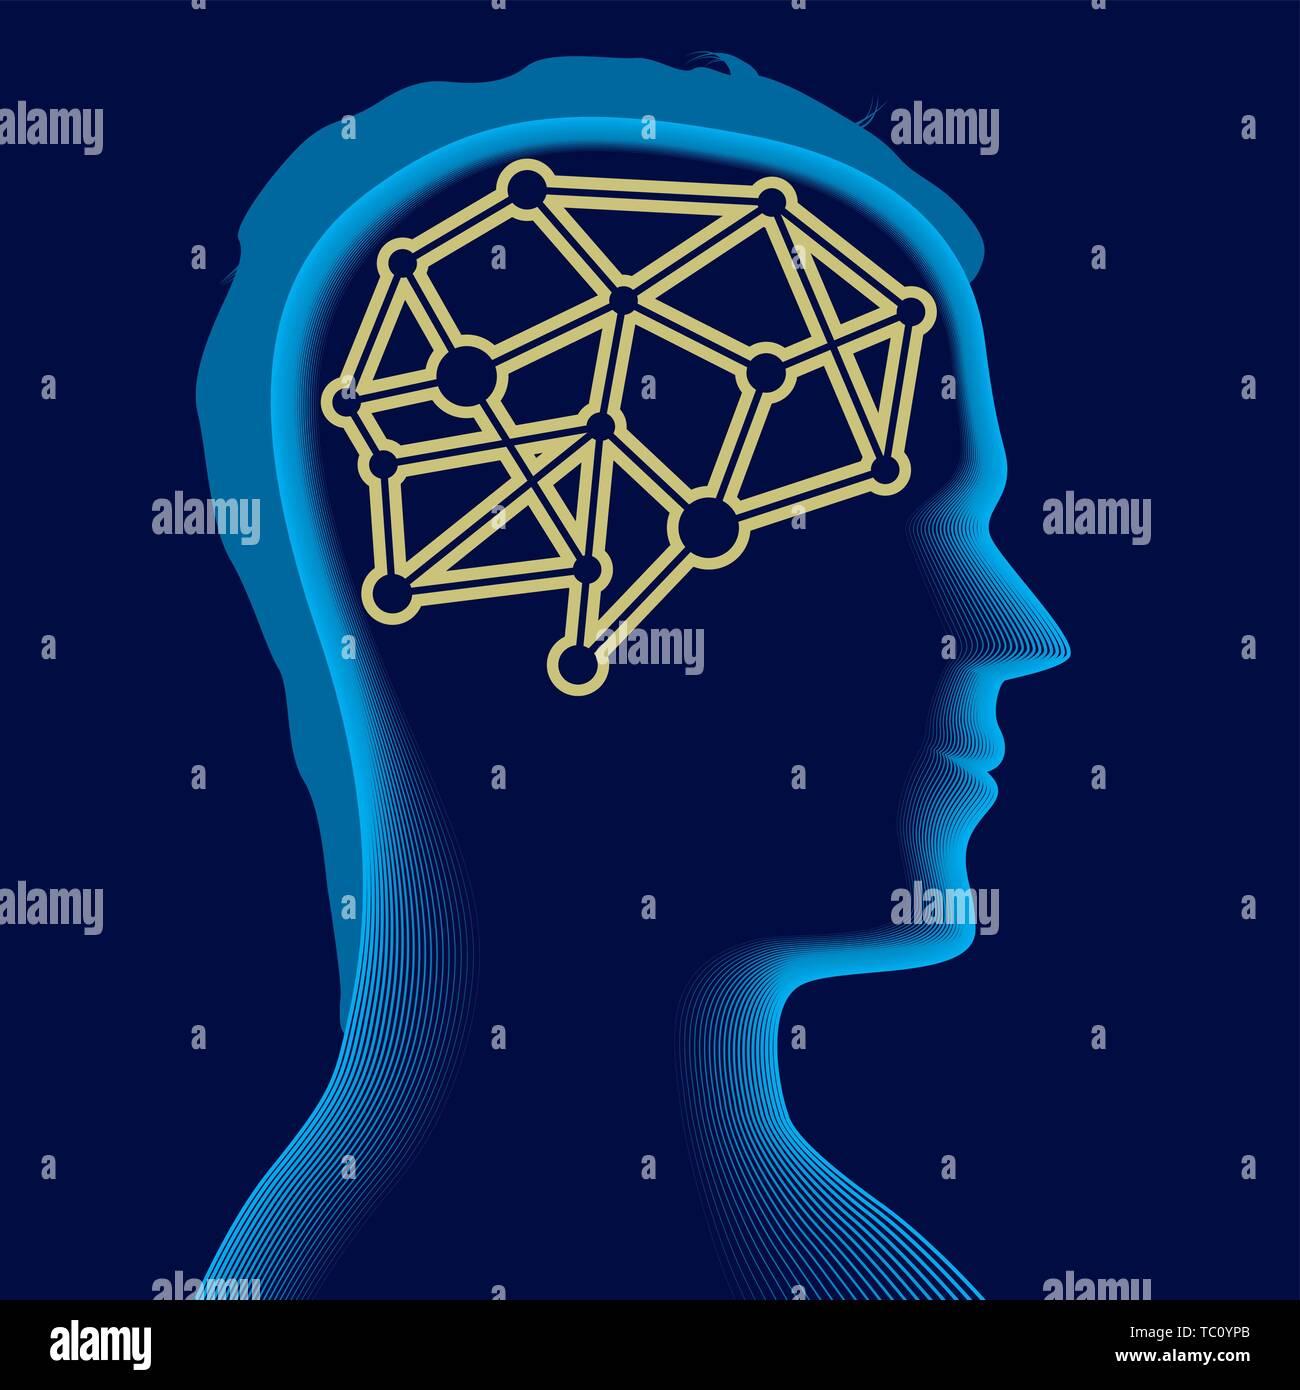 Vector illustration. Brain icon over a soft male head silhouette in blue. - Stock Vector